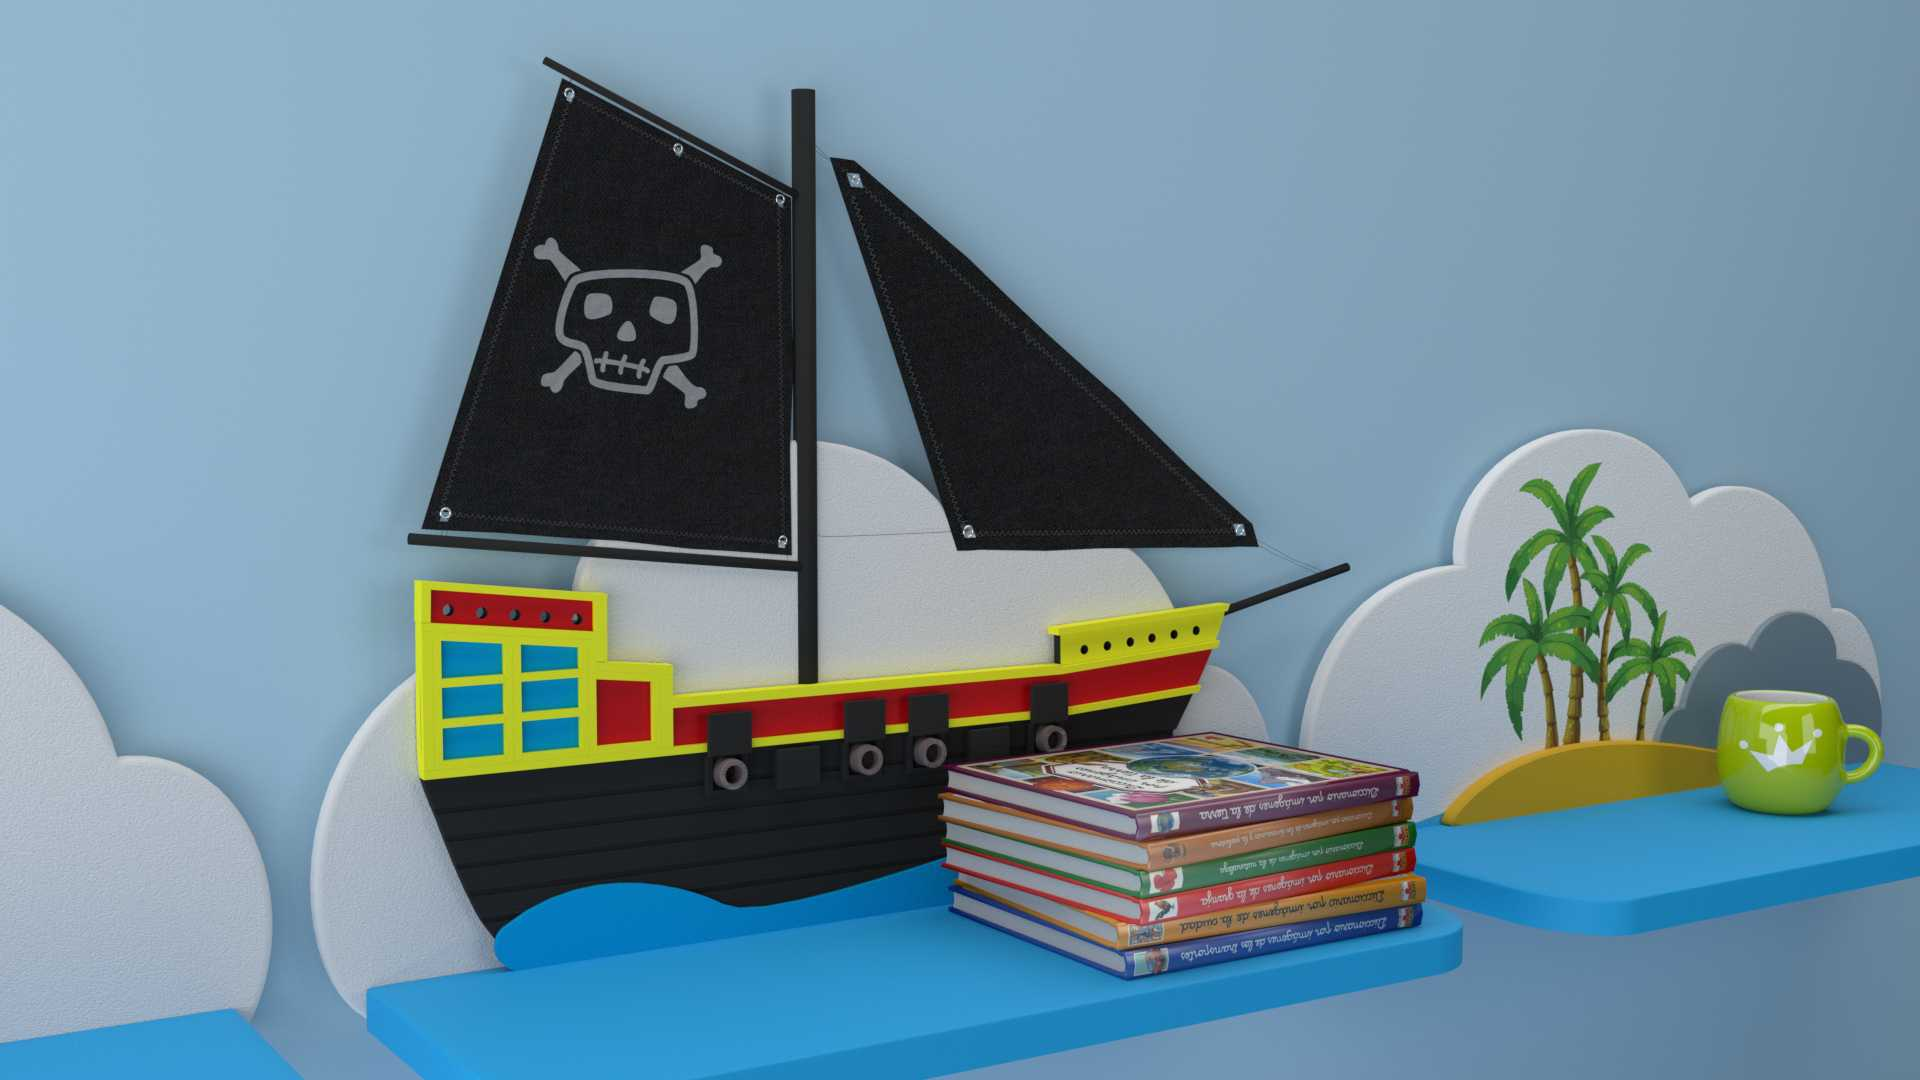 Model Piraten Wandregal Vista 2